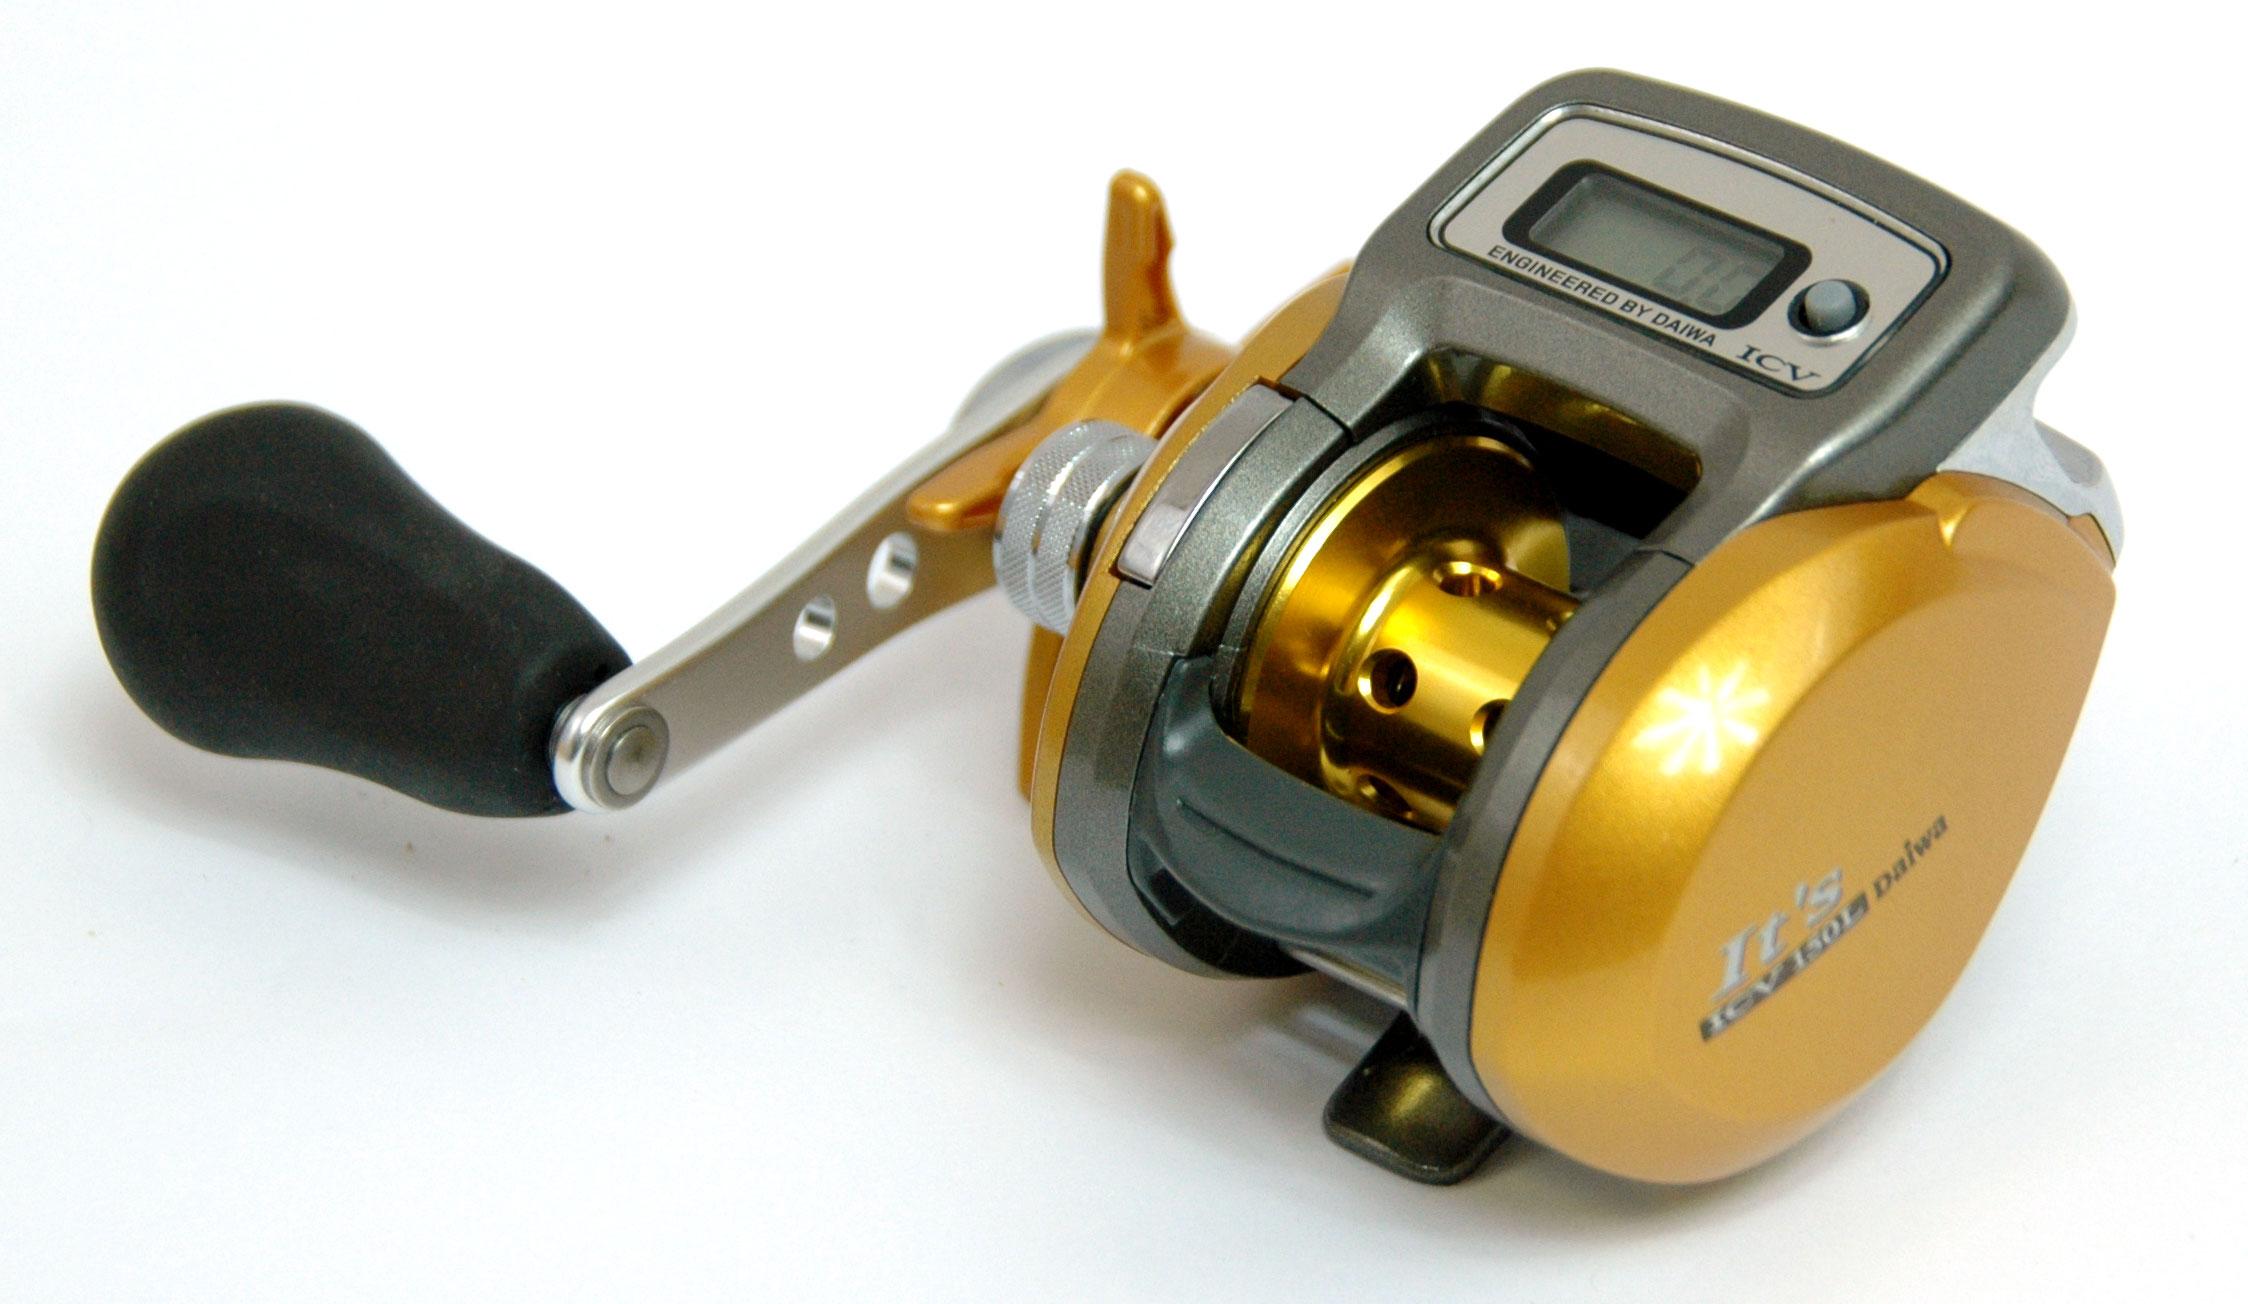 Clearance daiwa it 39 s icv 150l left hand wind multiplier for Digital fishing reel